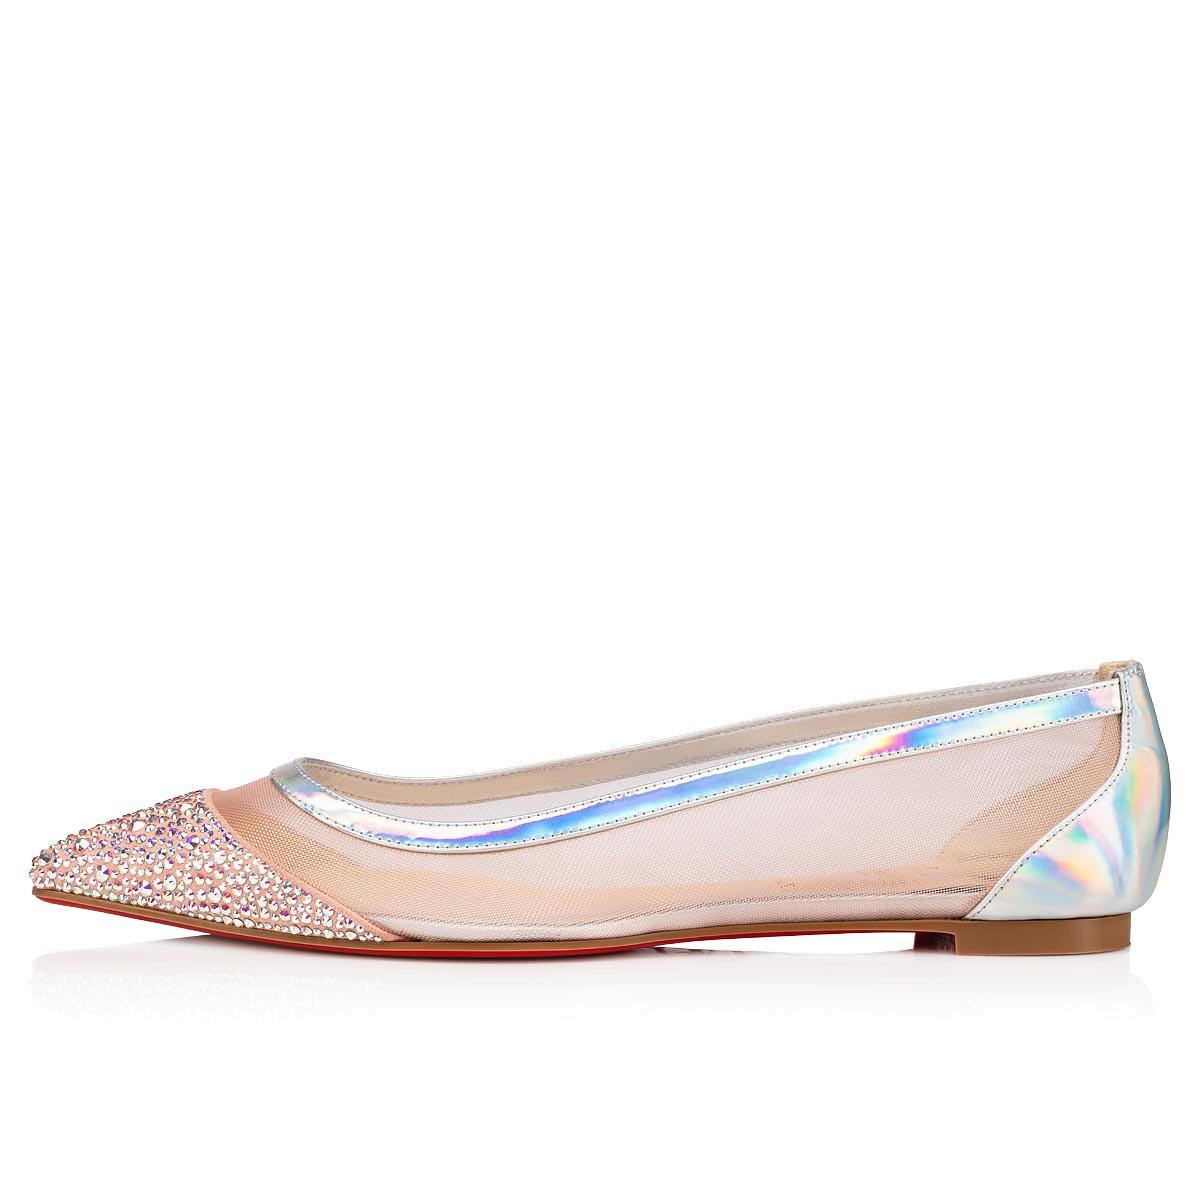 Shoes - Galativi P Strass Flat - Christian Louboutin